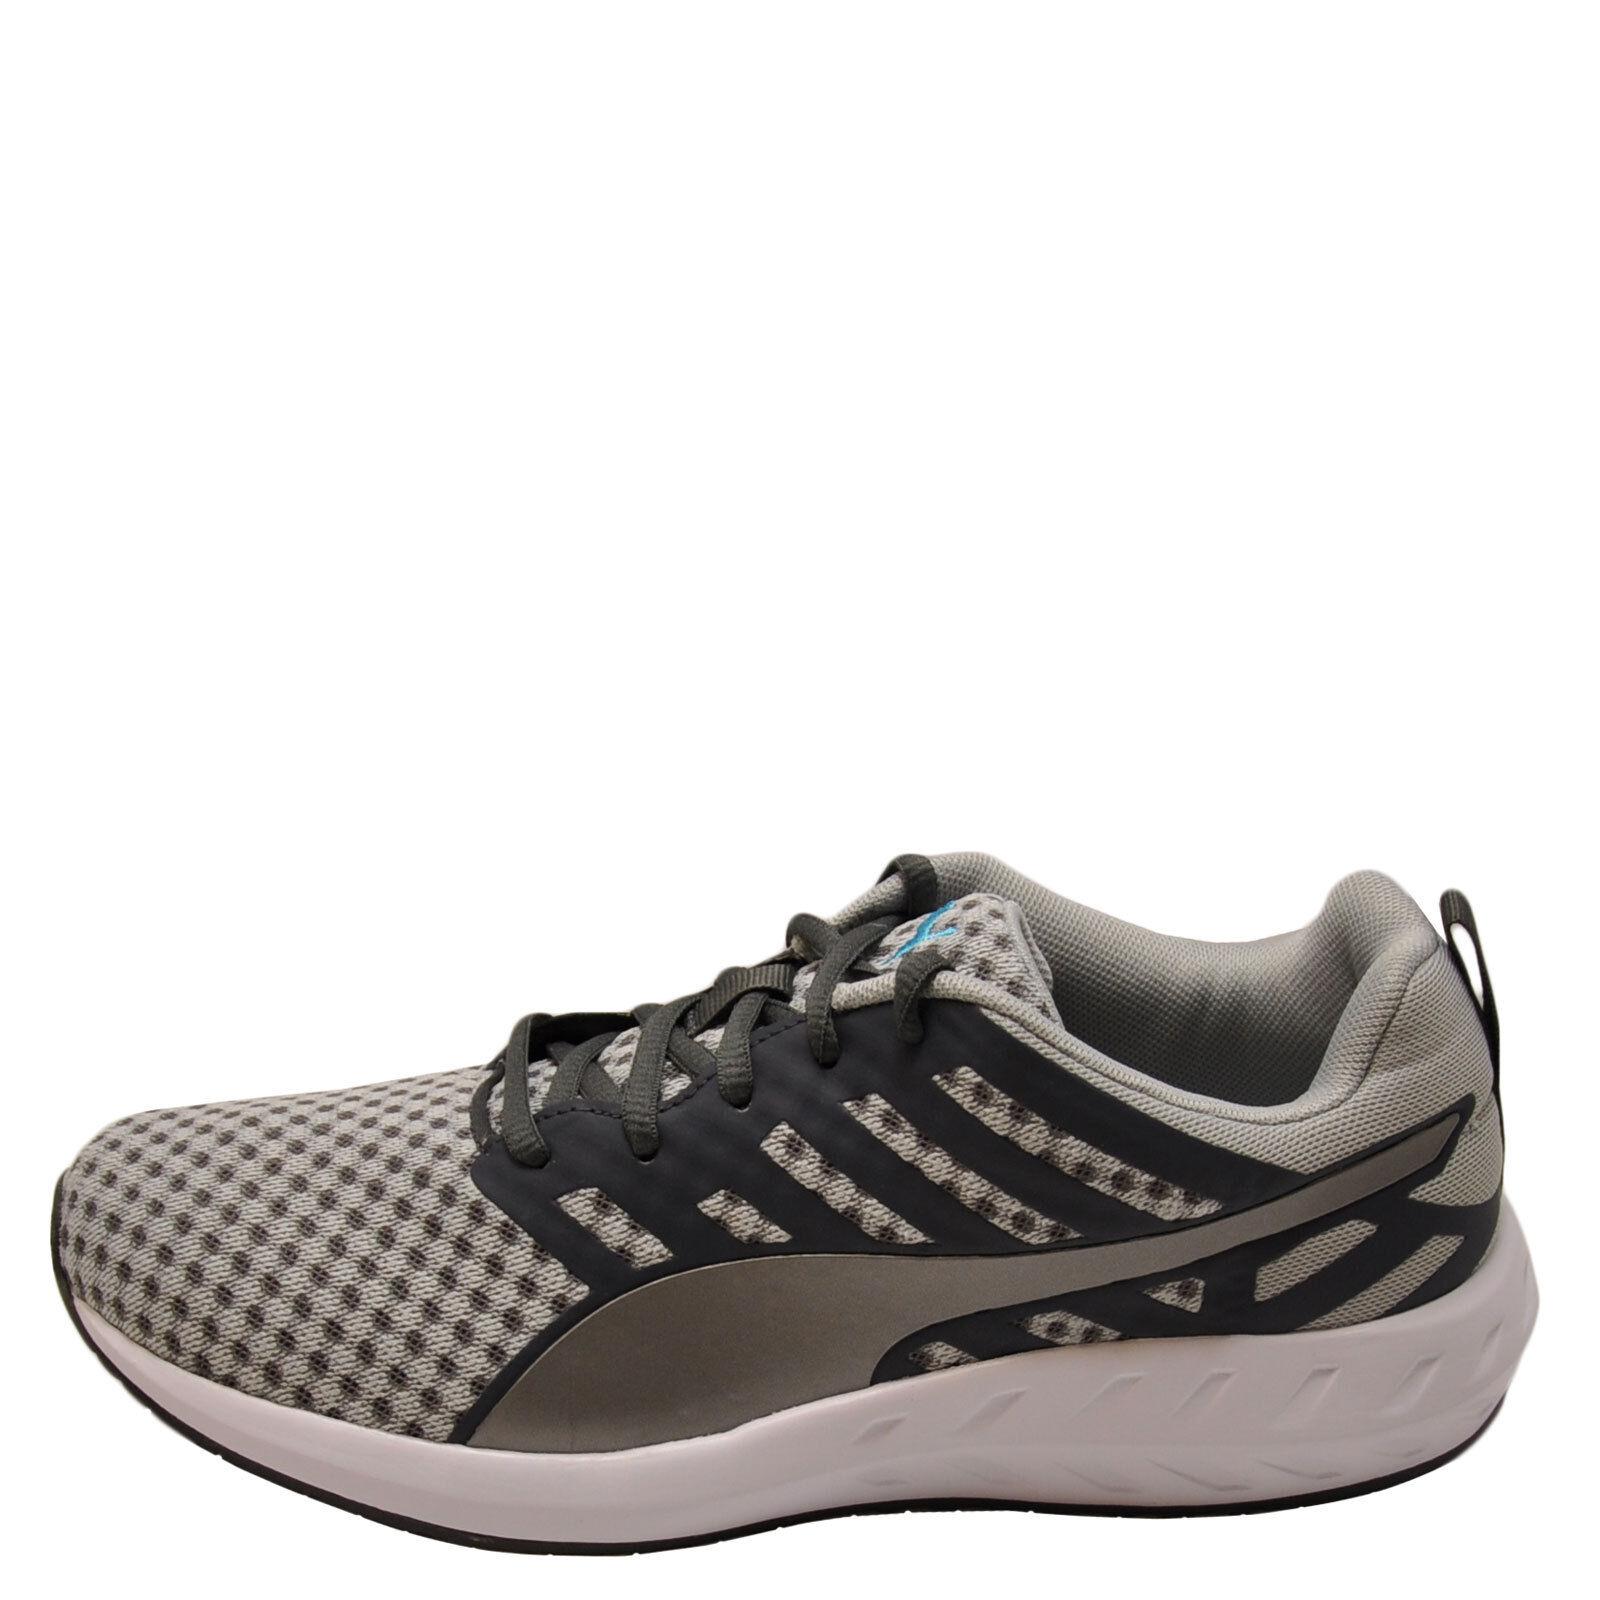 PUMA Flare Asphalt Quarry Men's Mesh Running Sneakers 188625-03